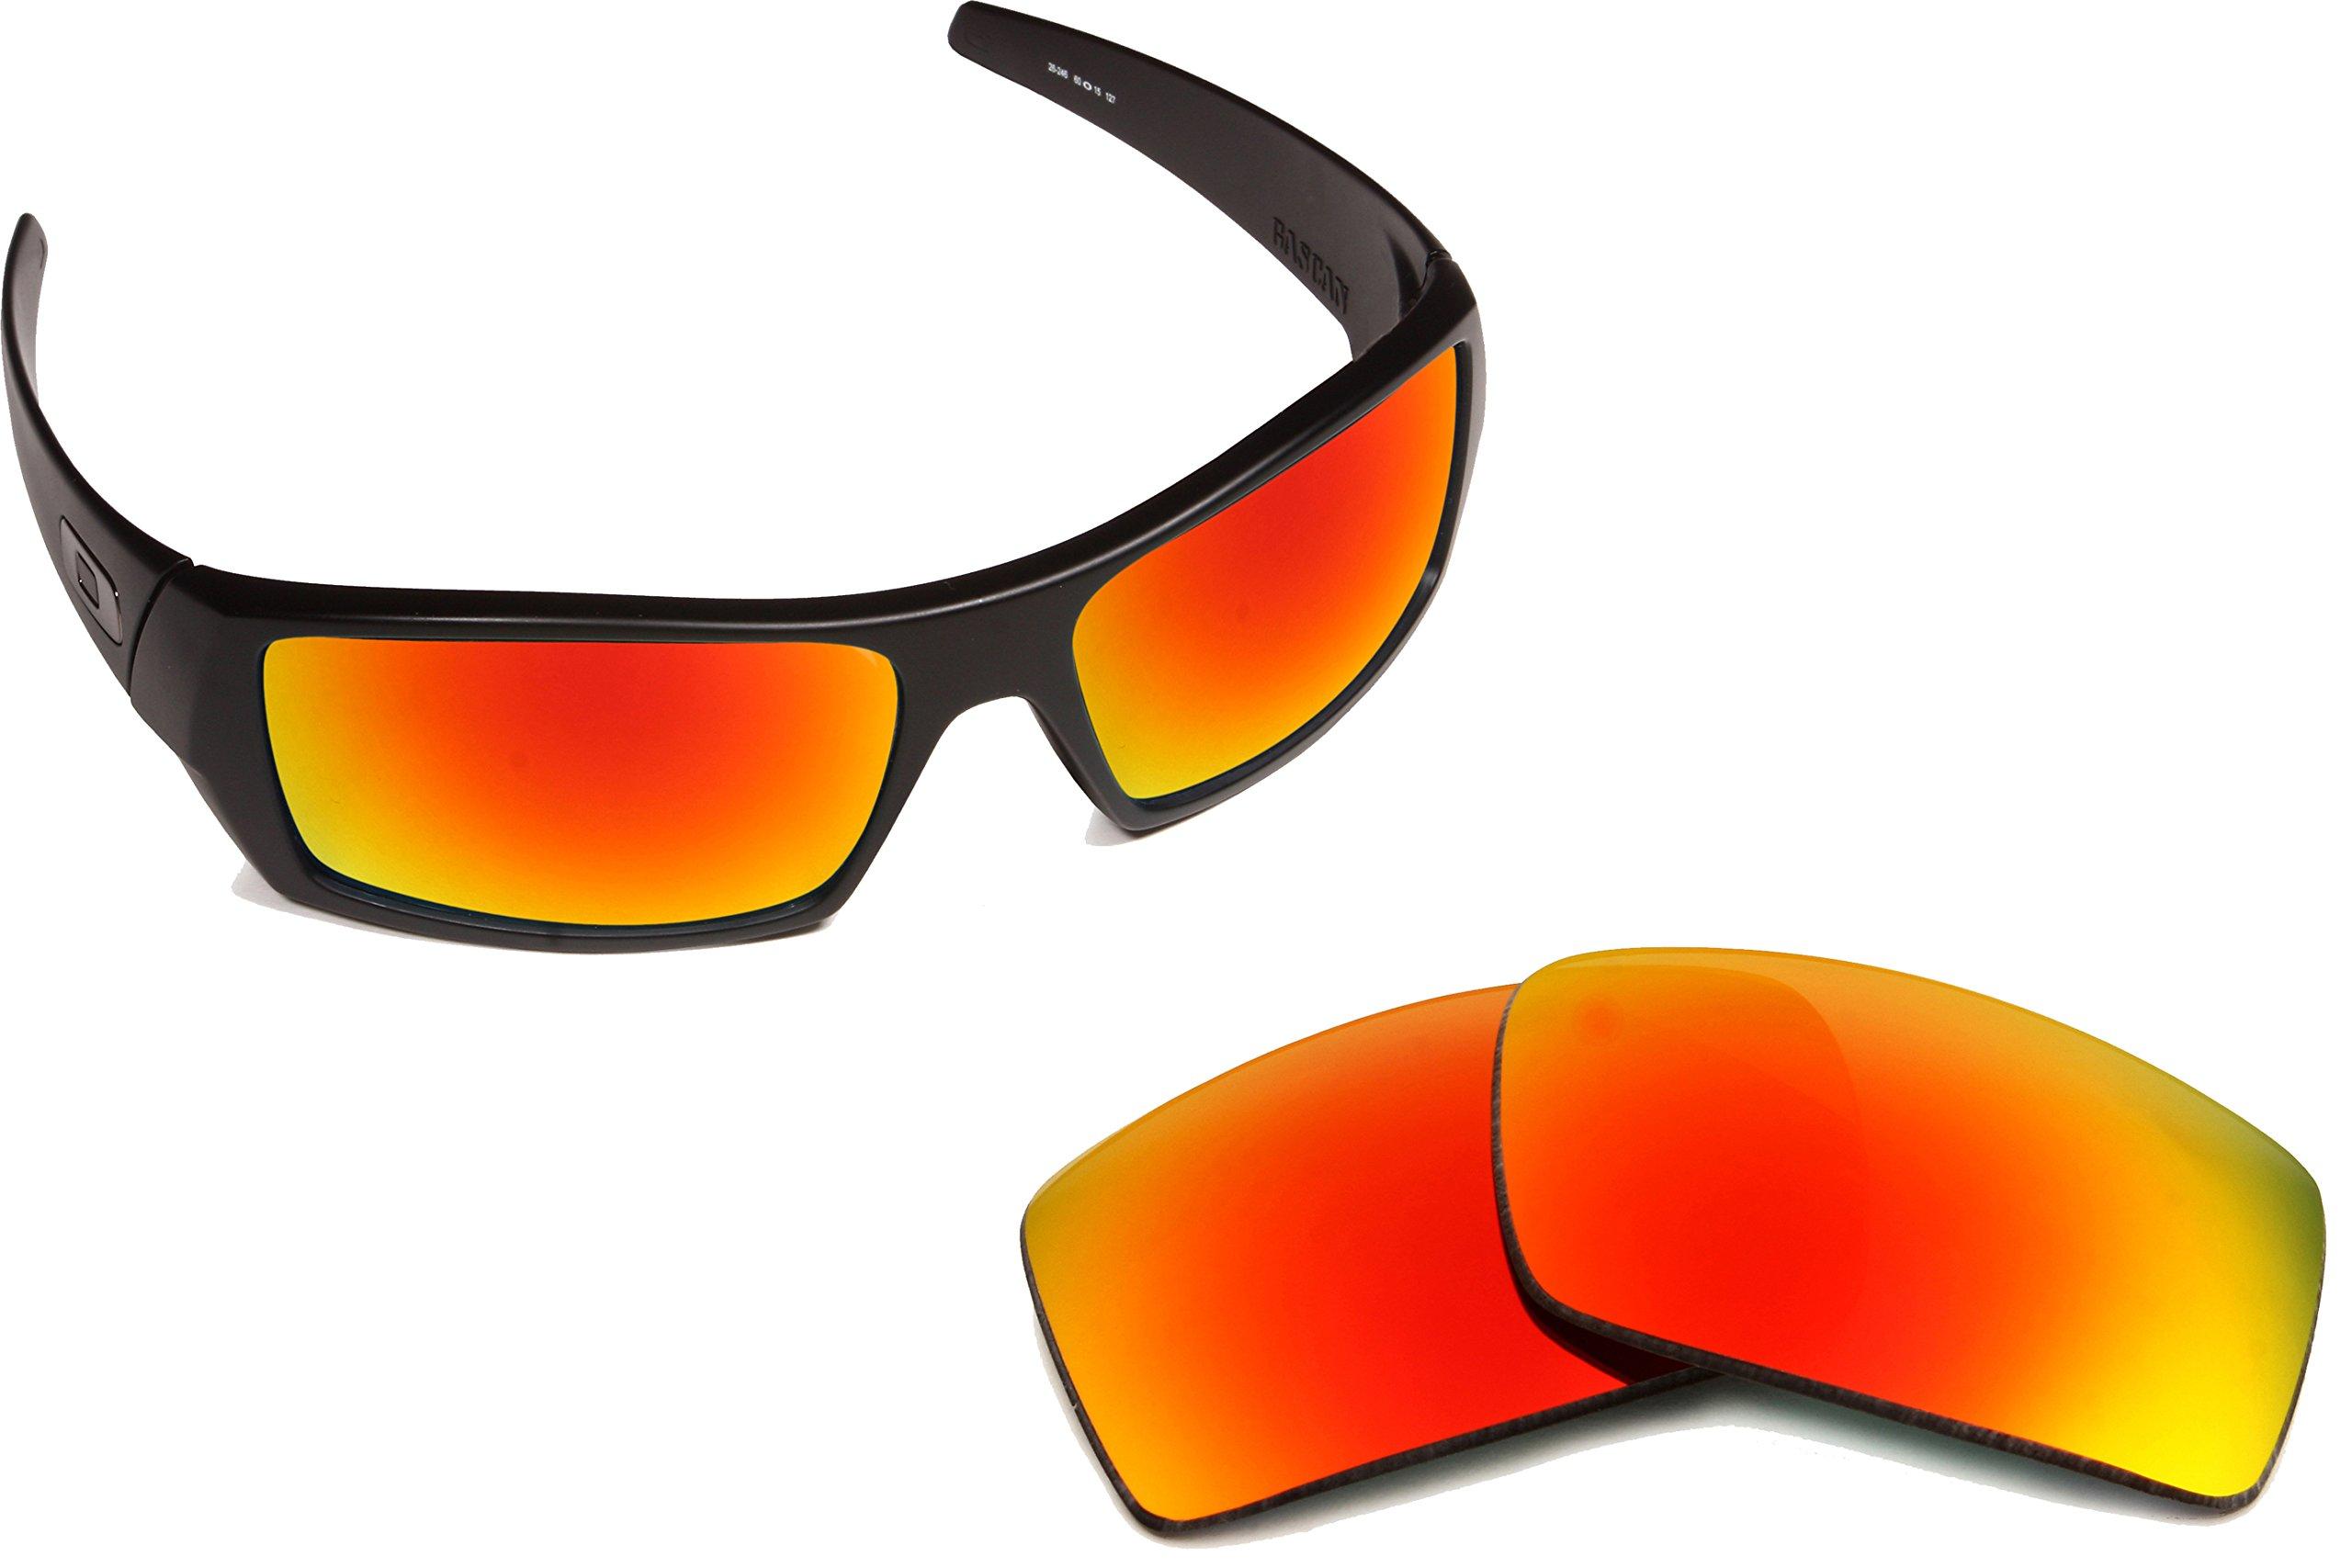 Best SEEK OPTICS Replacement Lenses Oakley GASCAN - Polarized Red Mirror by Seek Optics